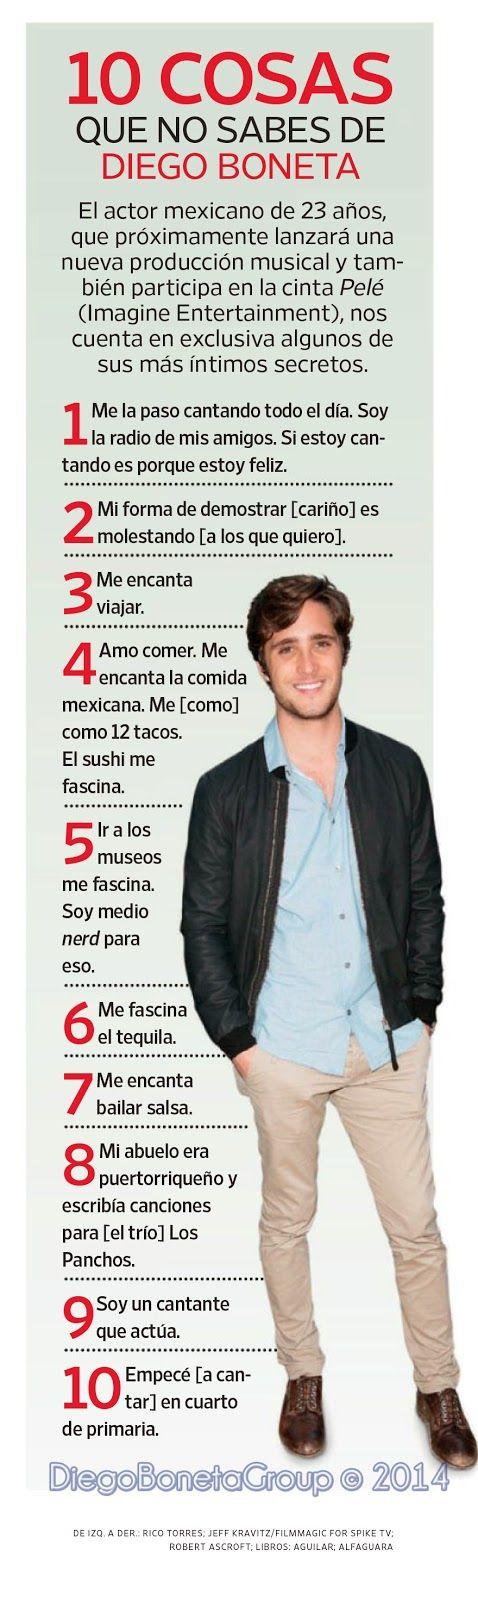 Diego Boneta Group: [SCAN] Diego Boneta en revista People en español Sep